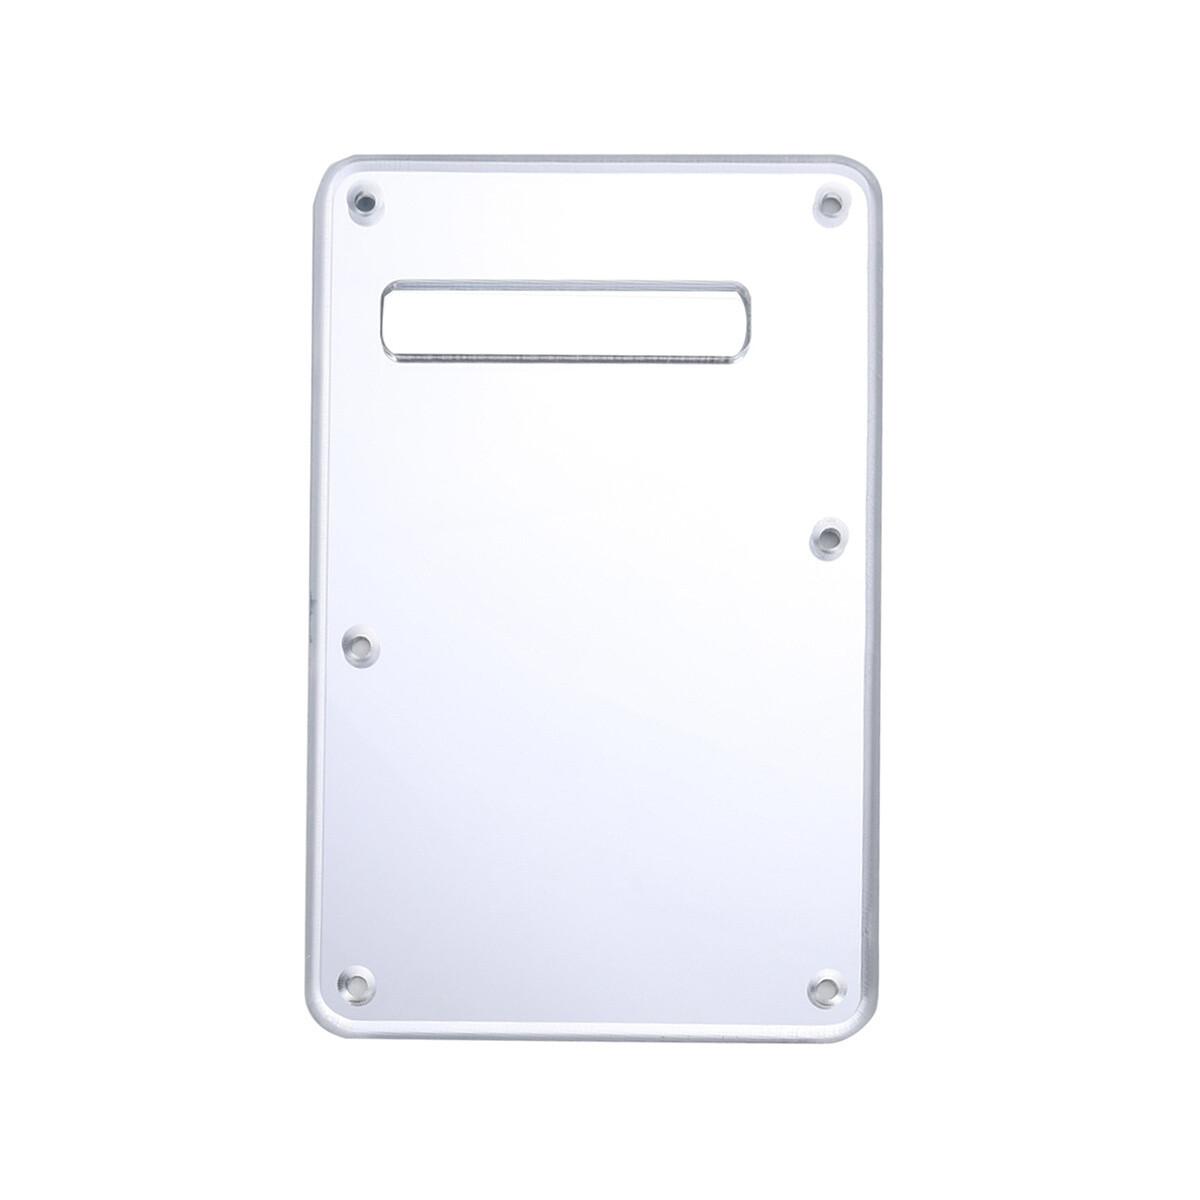 Brio Modern Back Plate Tremolo Cover Silver Mirror Acrylic fits American/Mexican Fender®Strat® Fit